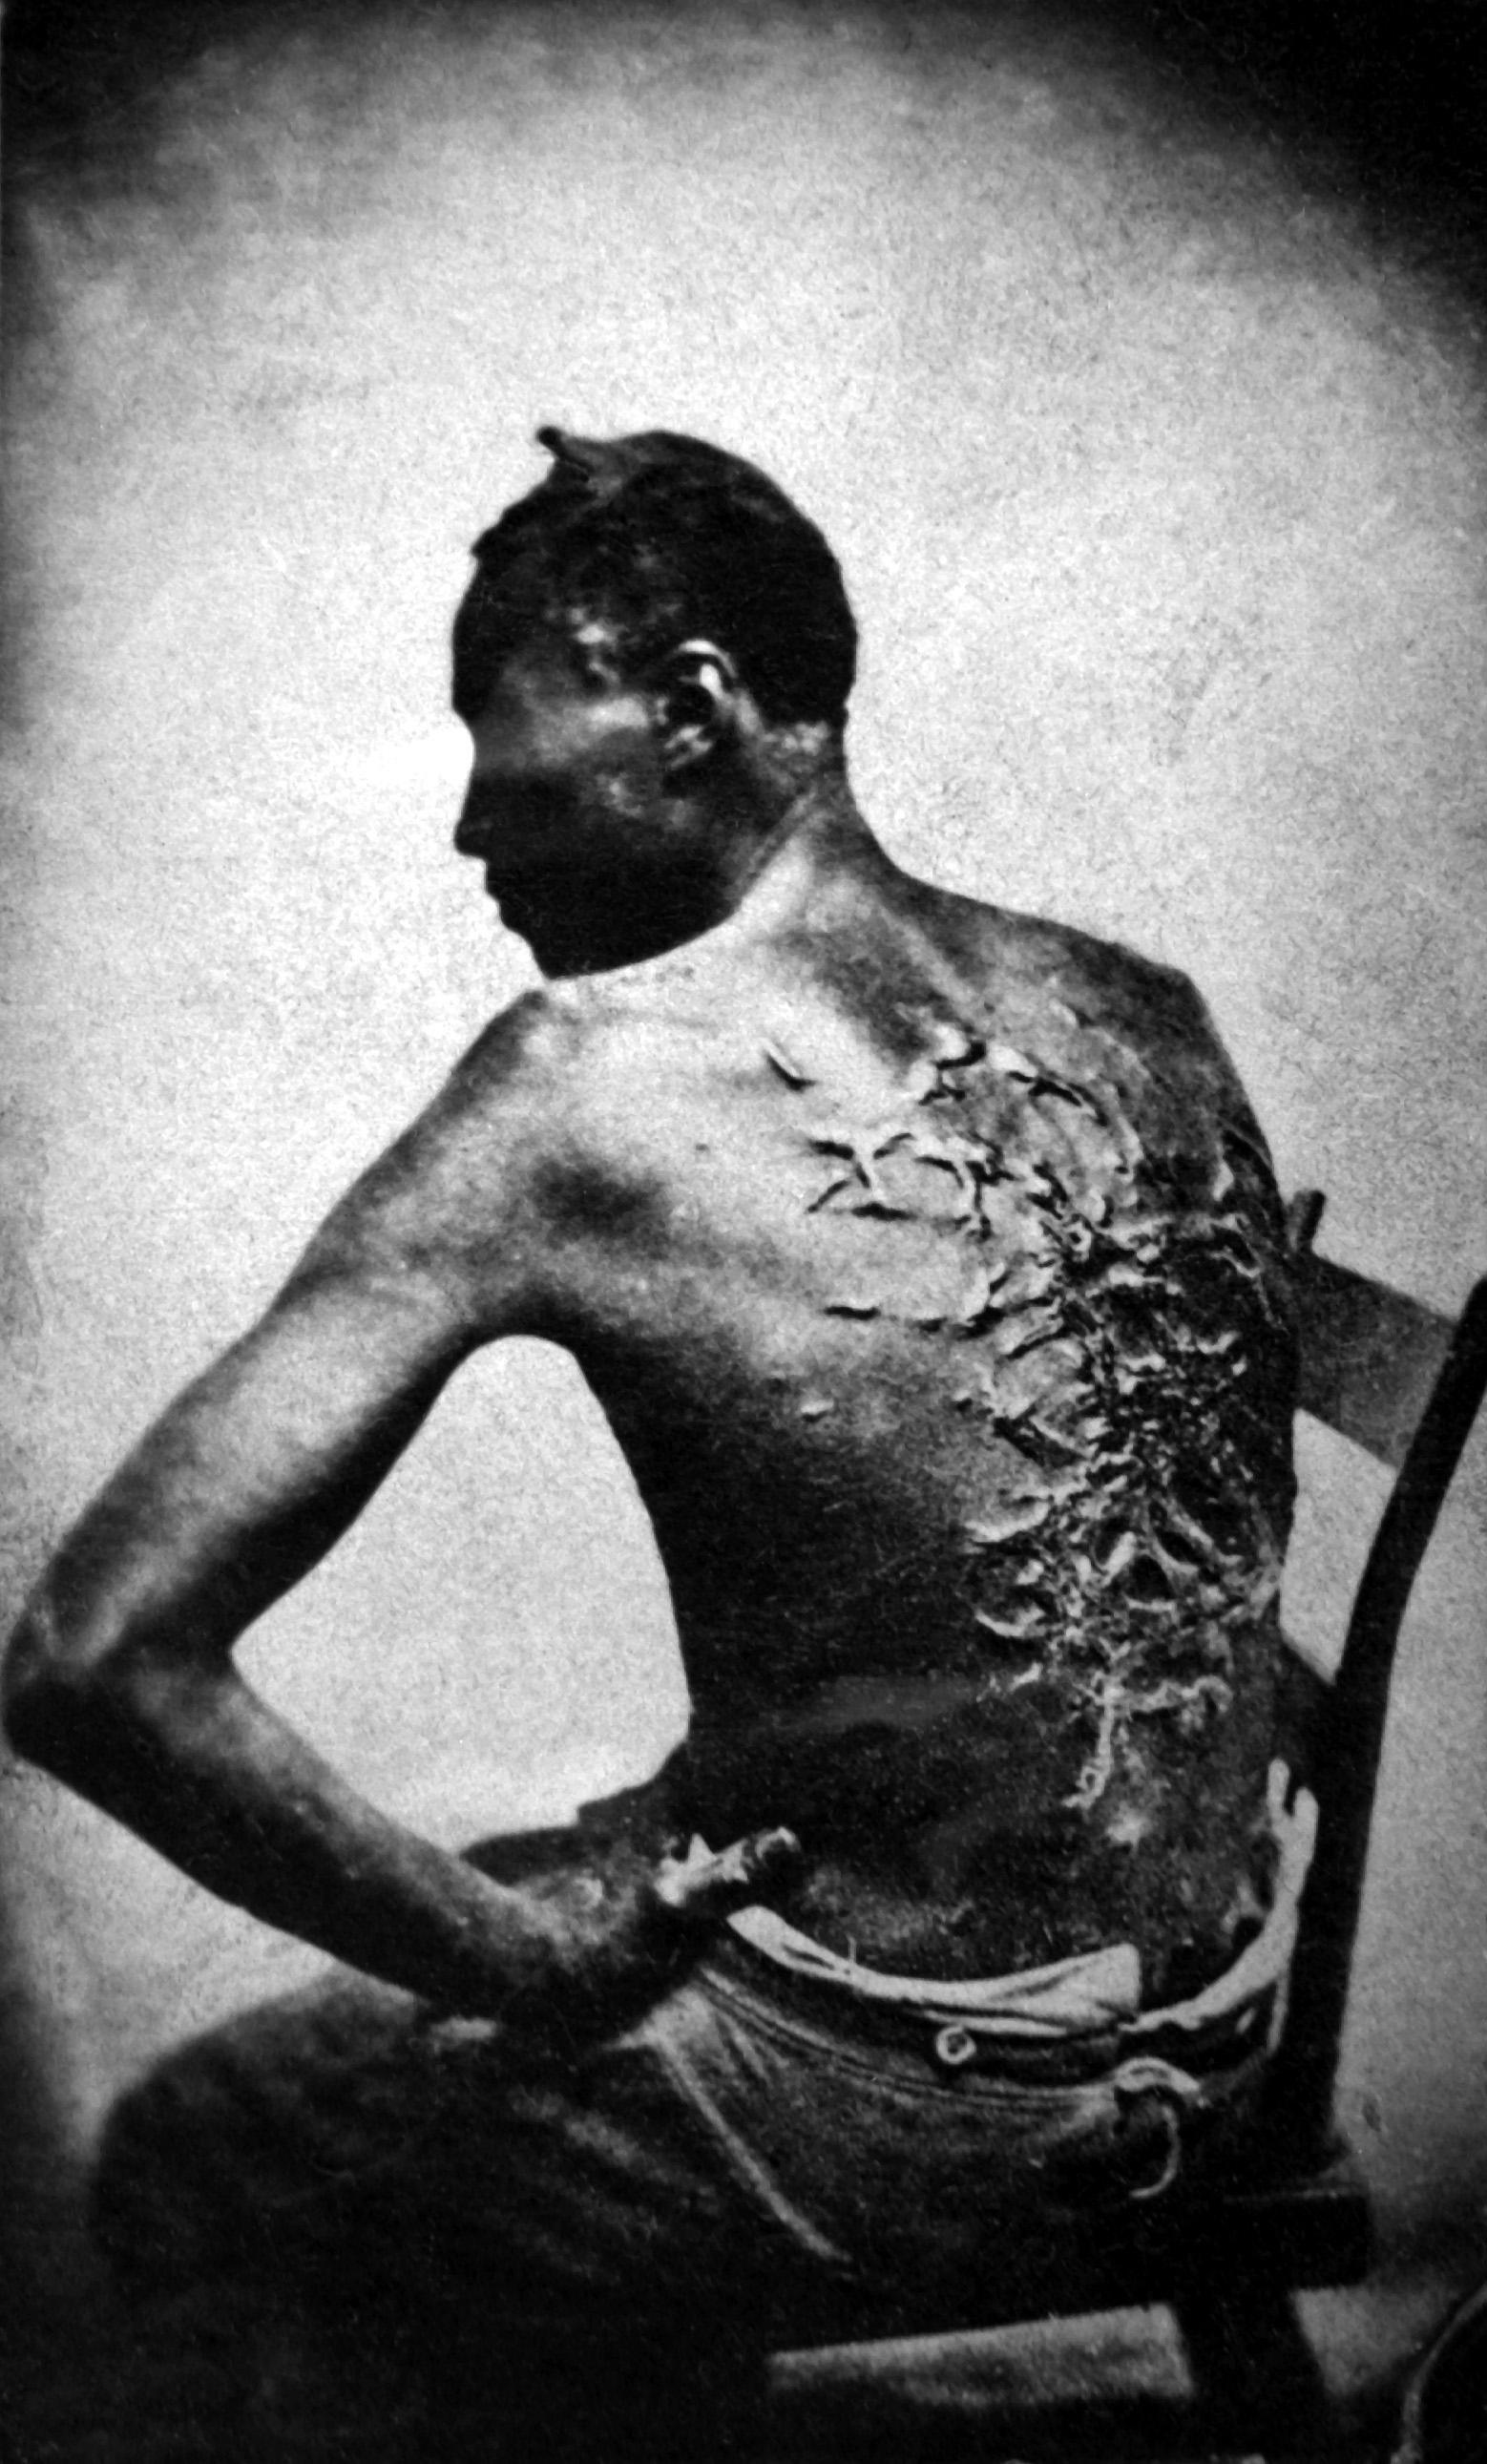 cicatrices_de_flagellation_sur_un_esclave.jpg